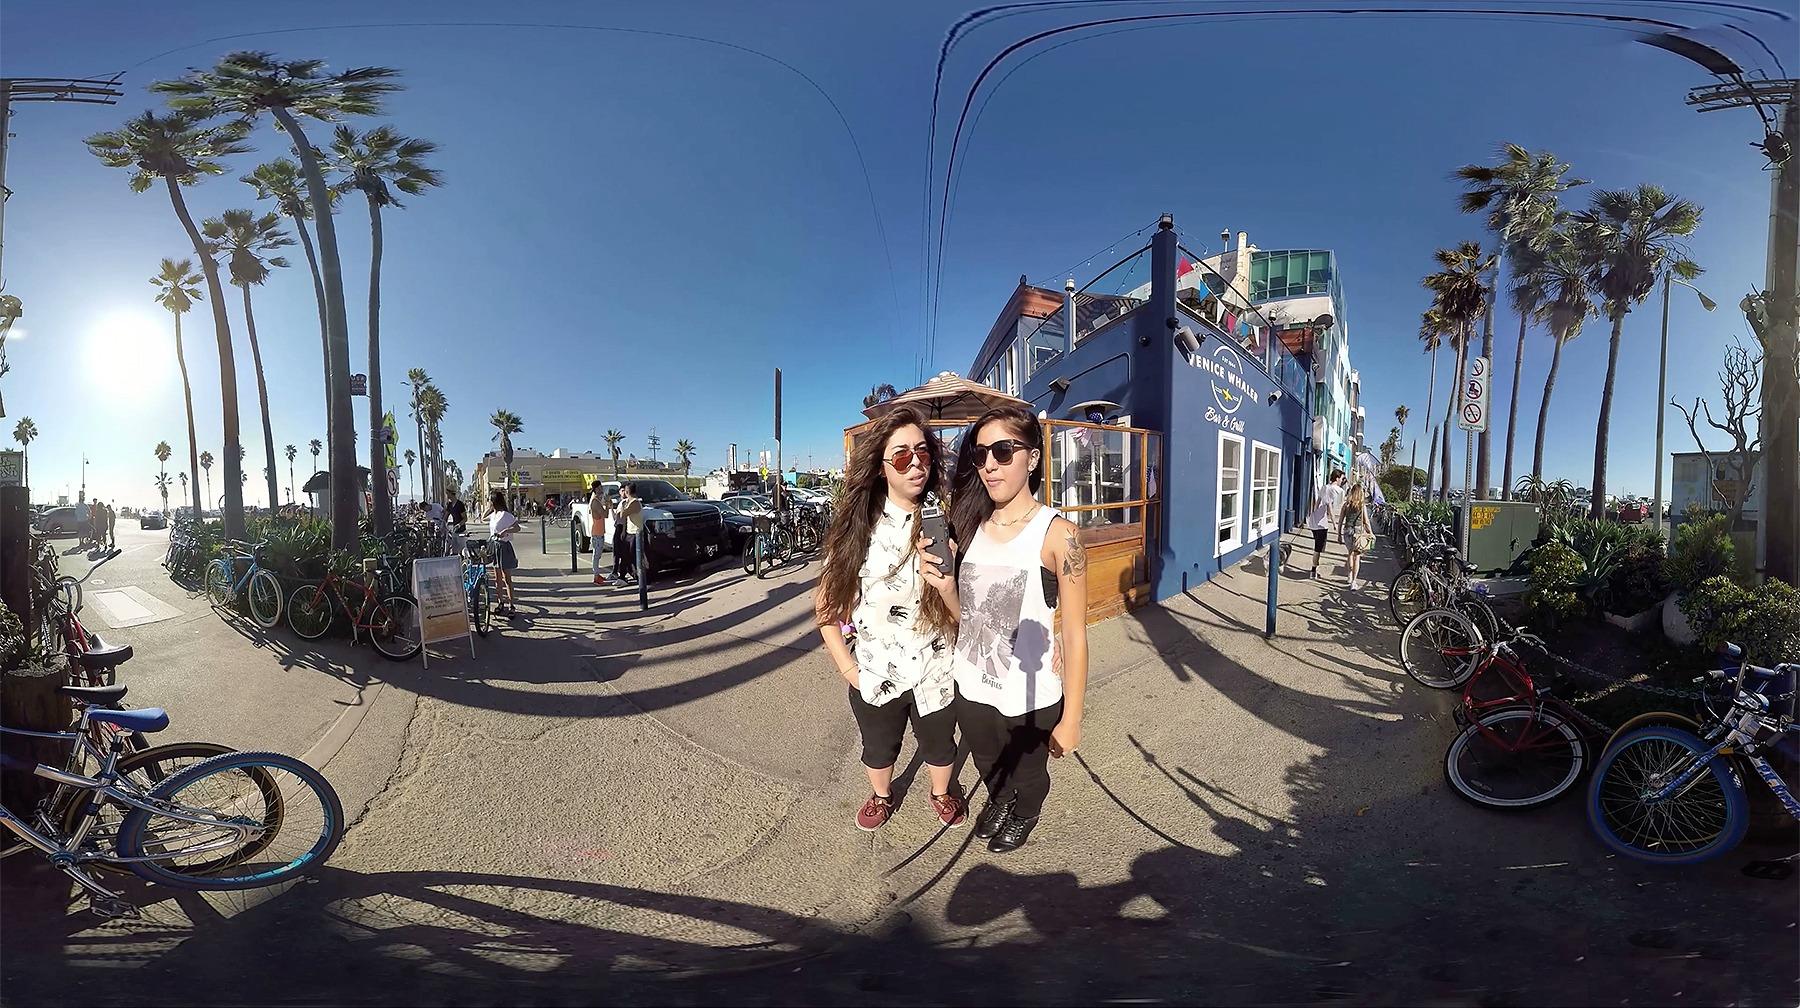 Travel_LosAngeles2_10Sept2015